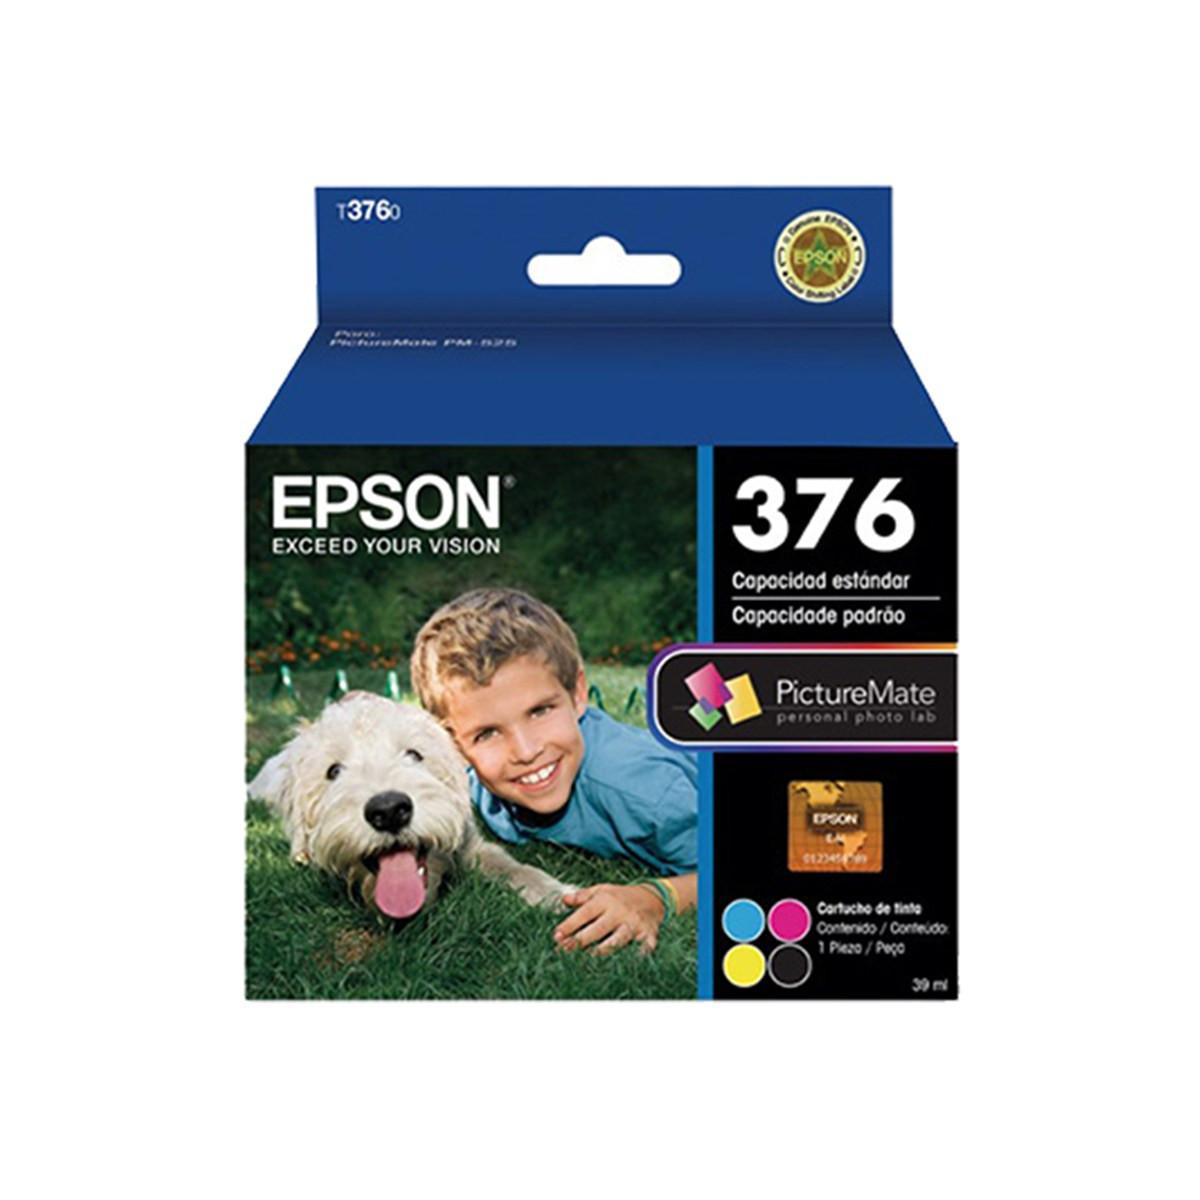 Cartucho de Tinta Fotográfico Epson T376020 4 Cores | PM-525 | Original